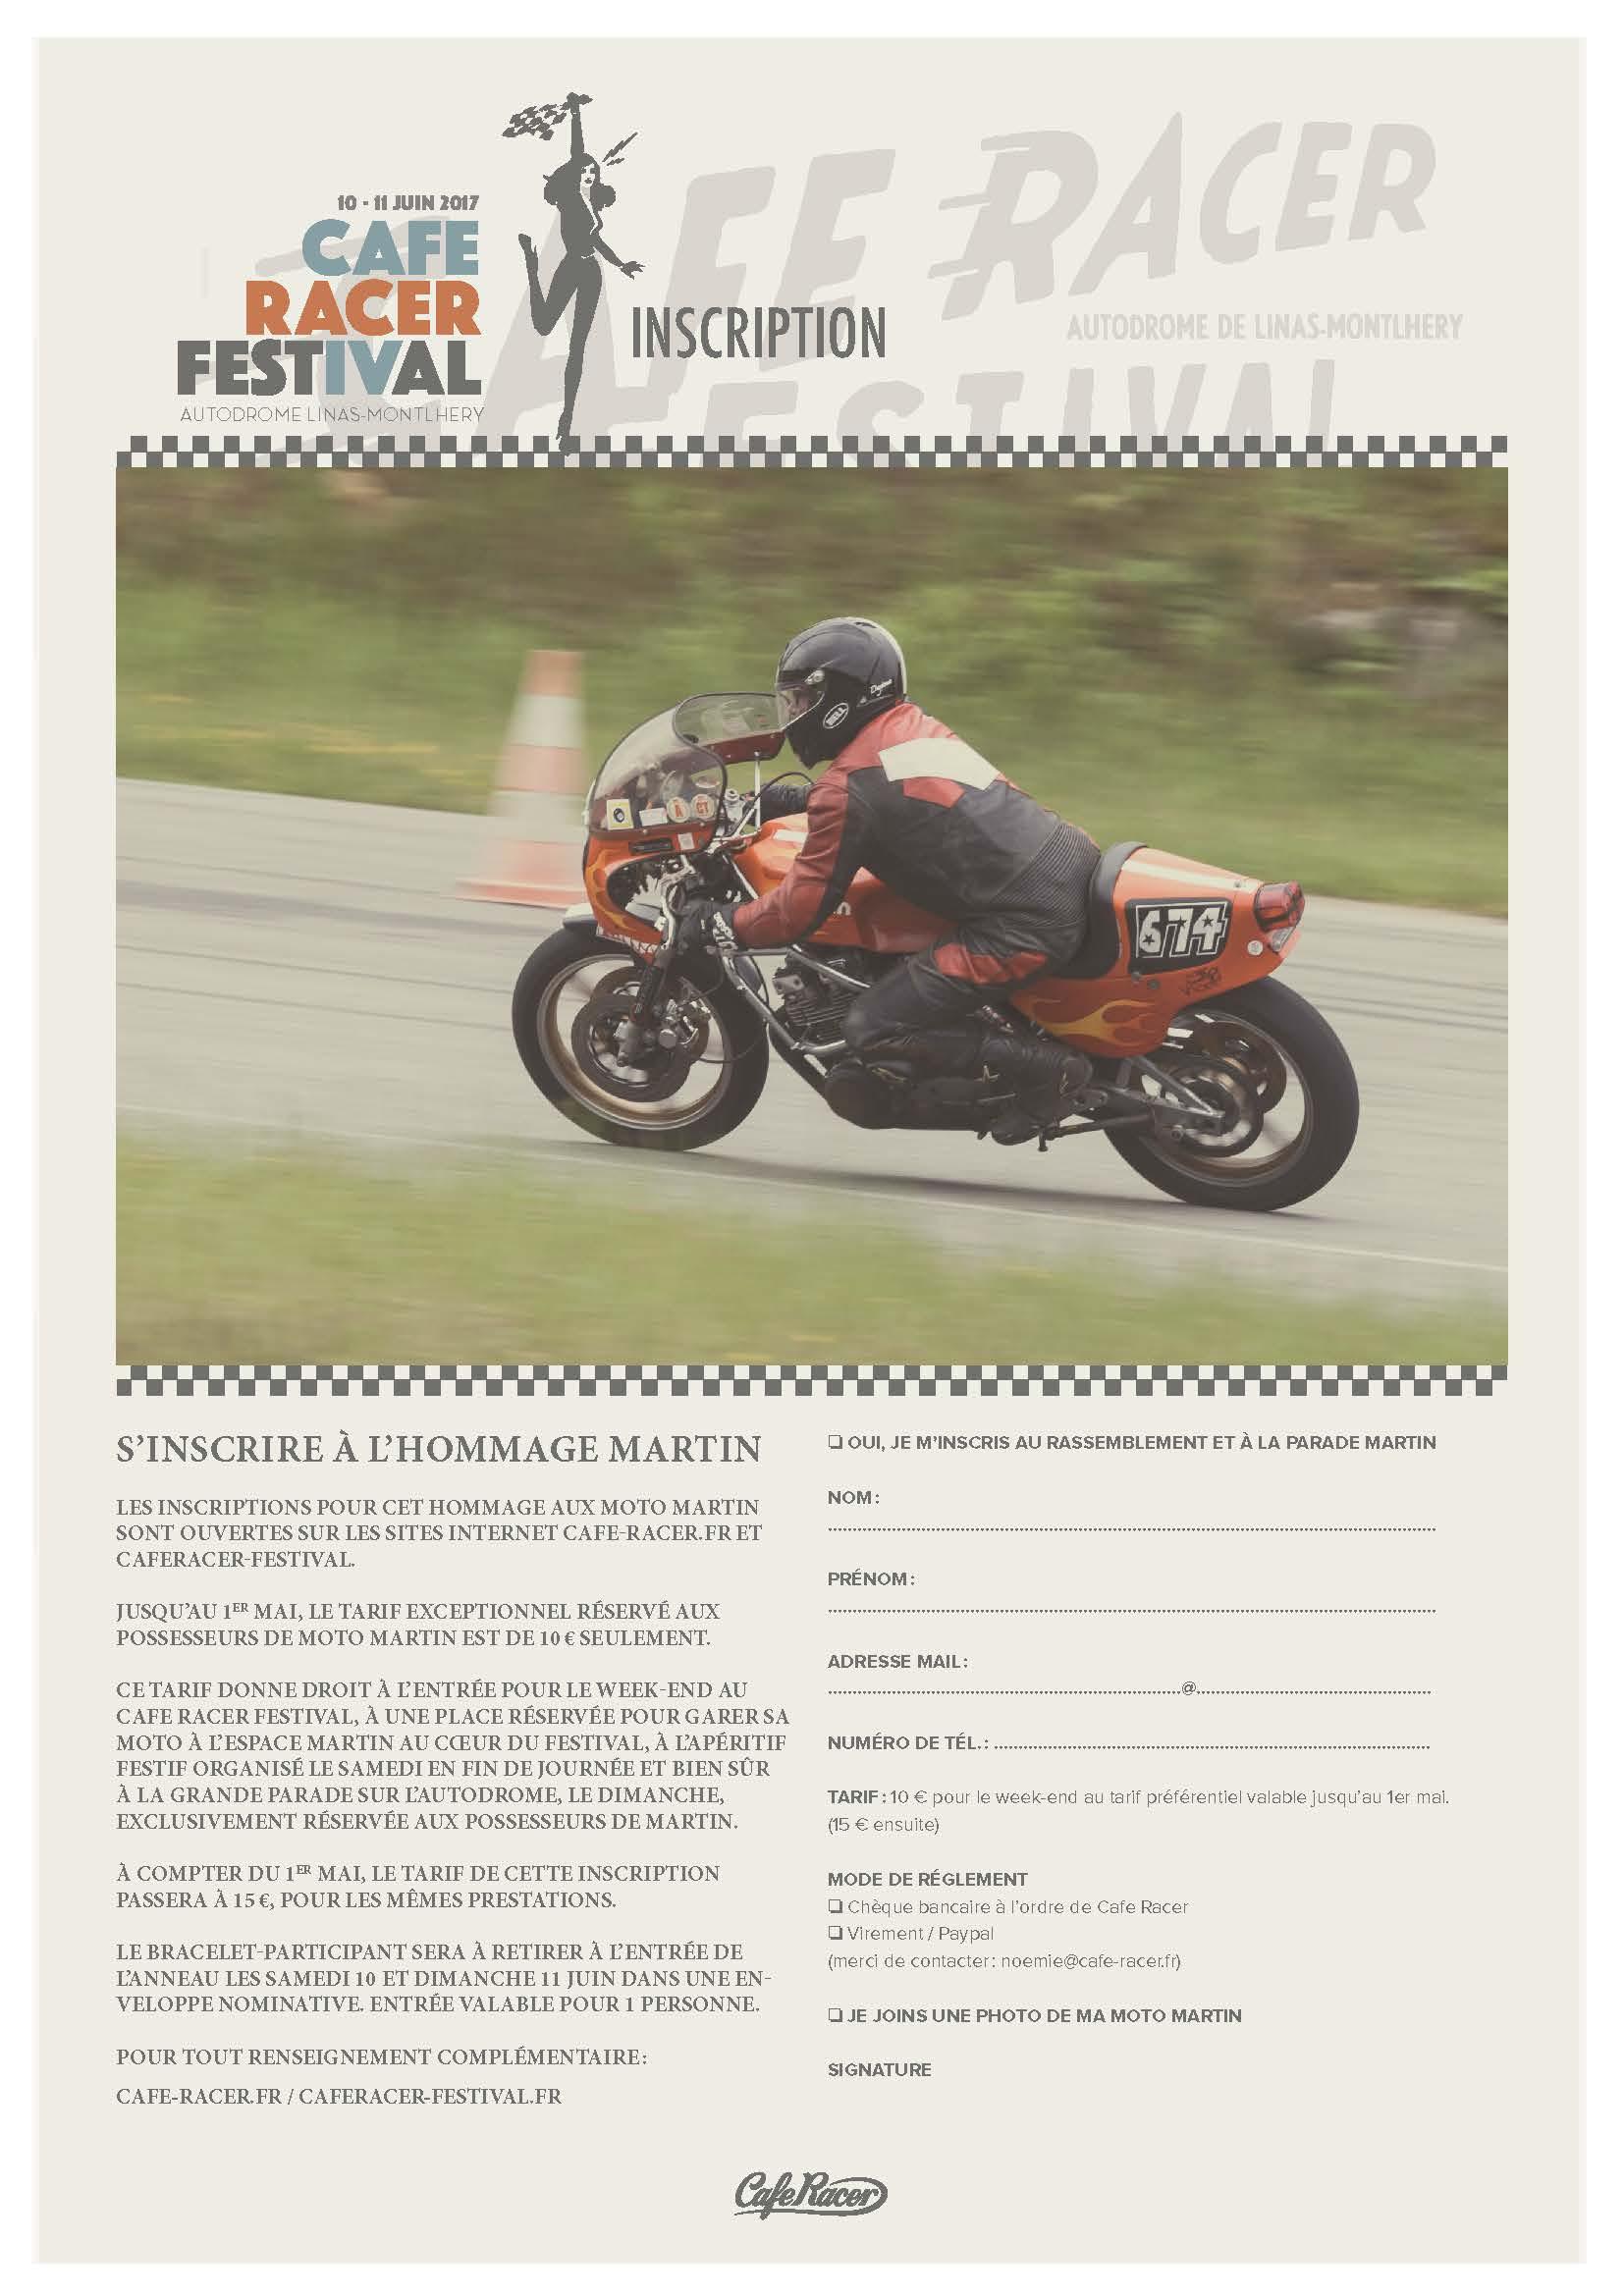 Cafe Racer Festival  Inscription Martin